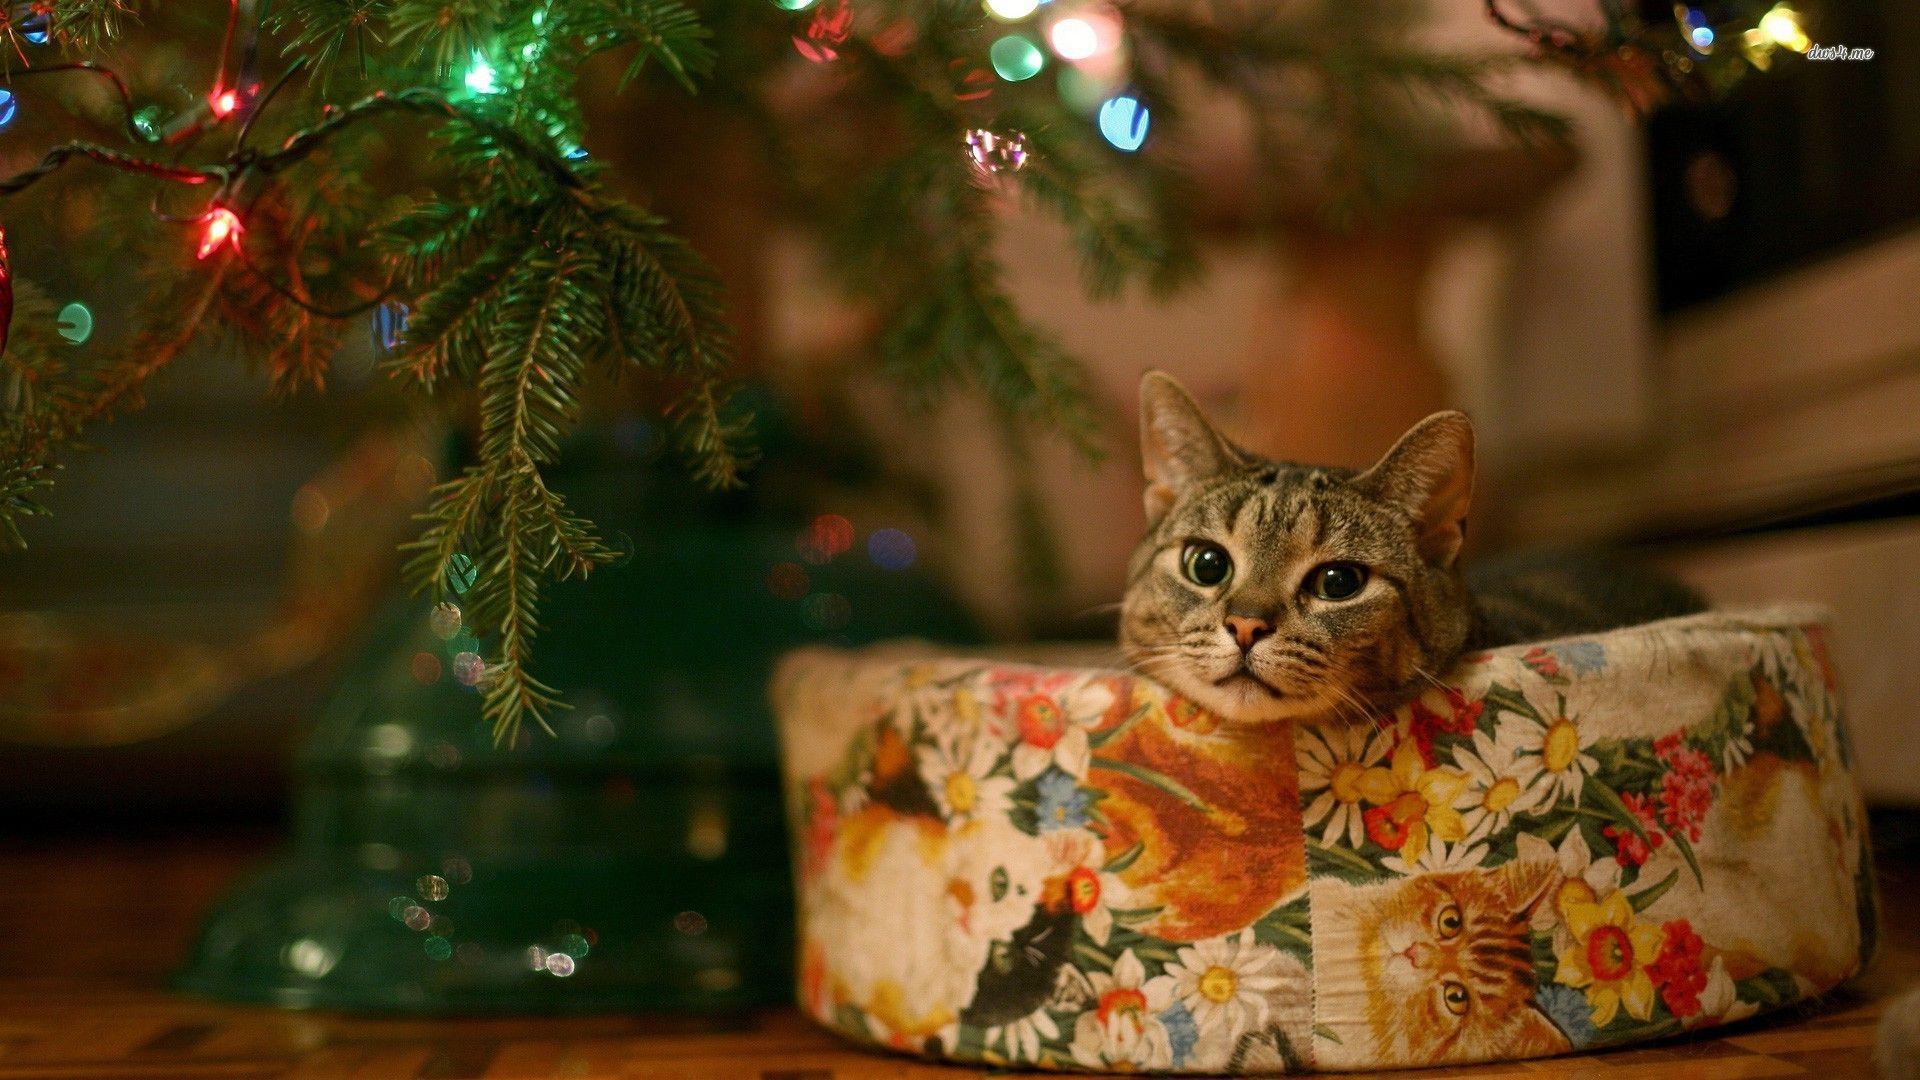 Christmas Tree Background Wallpaper